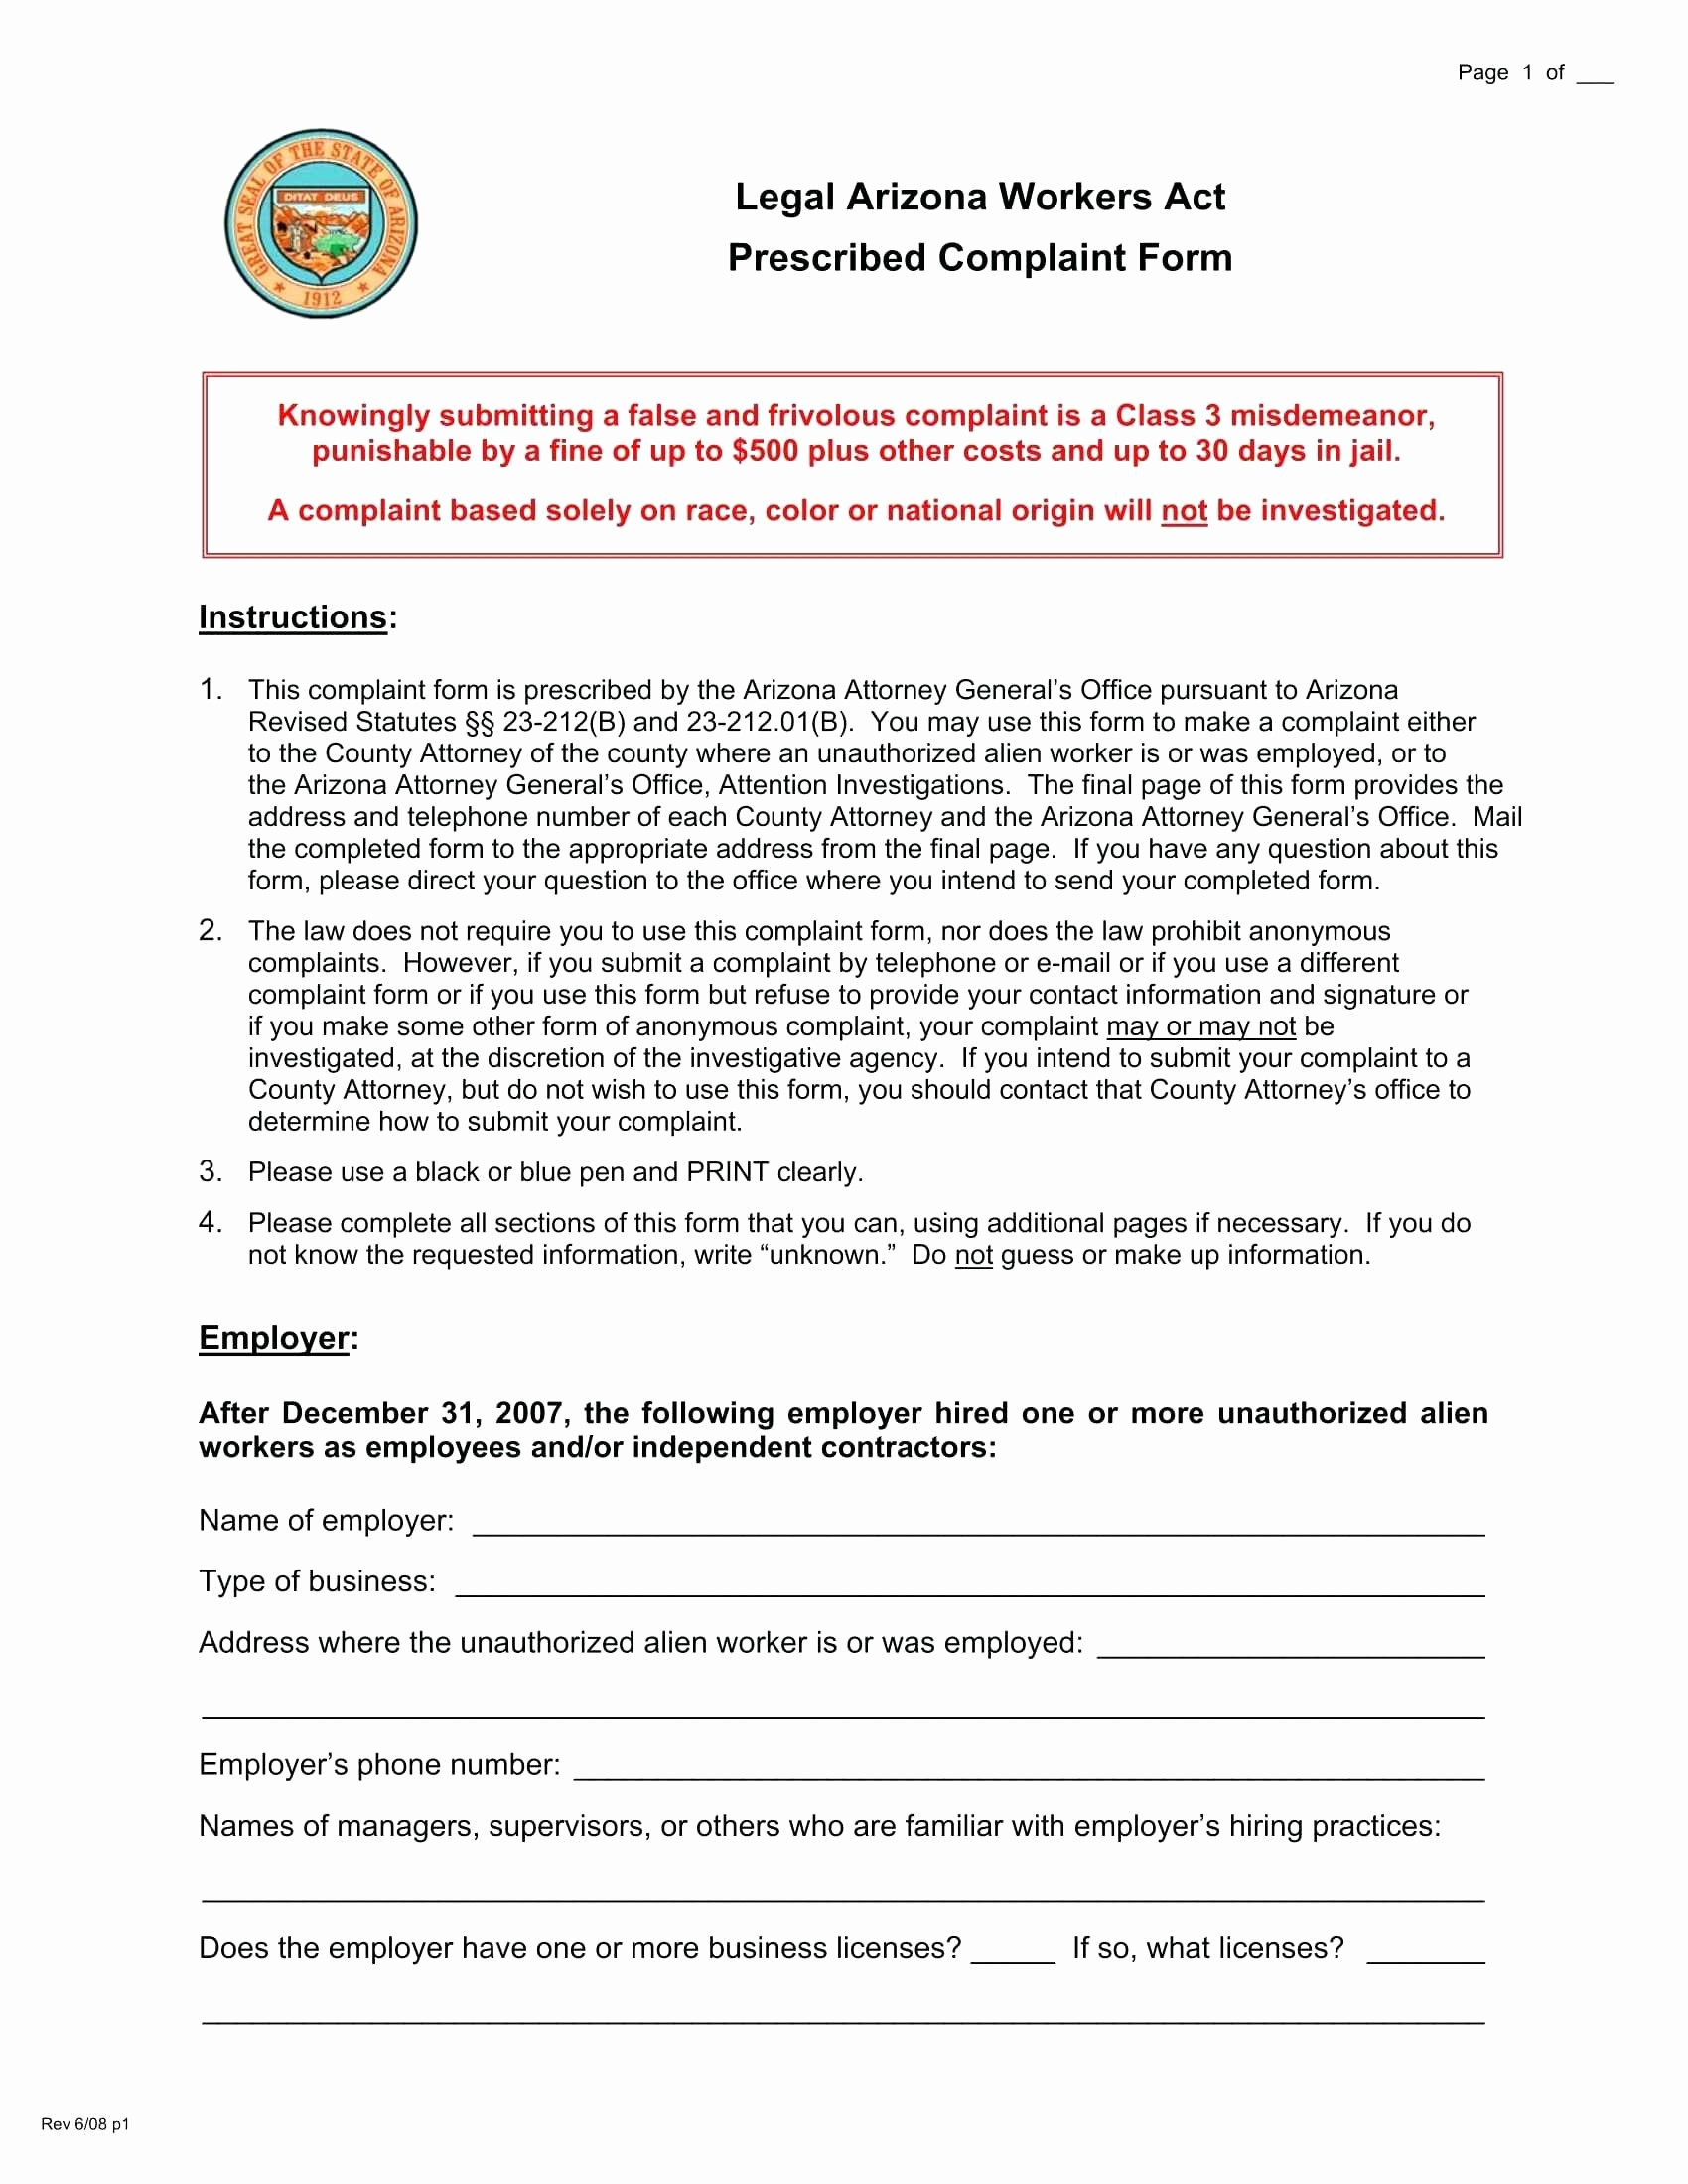 Microsoft Word Legal Complaint Template Best Of Template Legal Plaint form Template